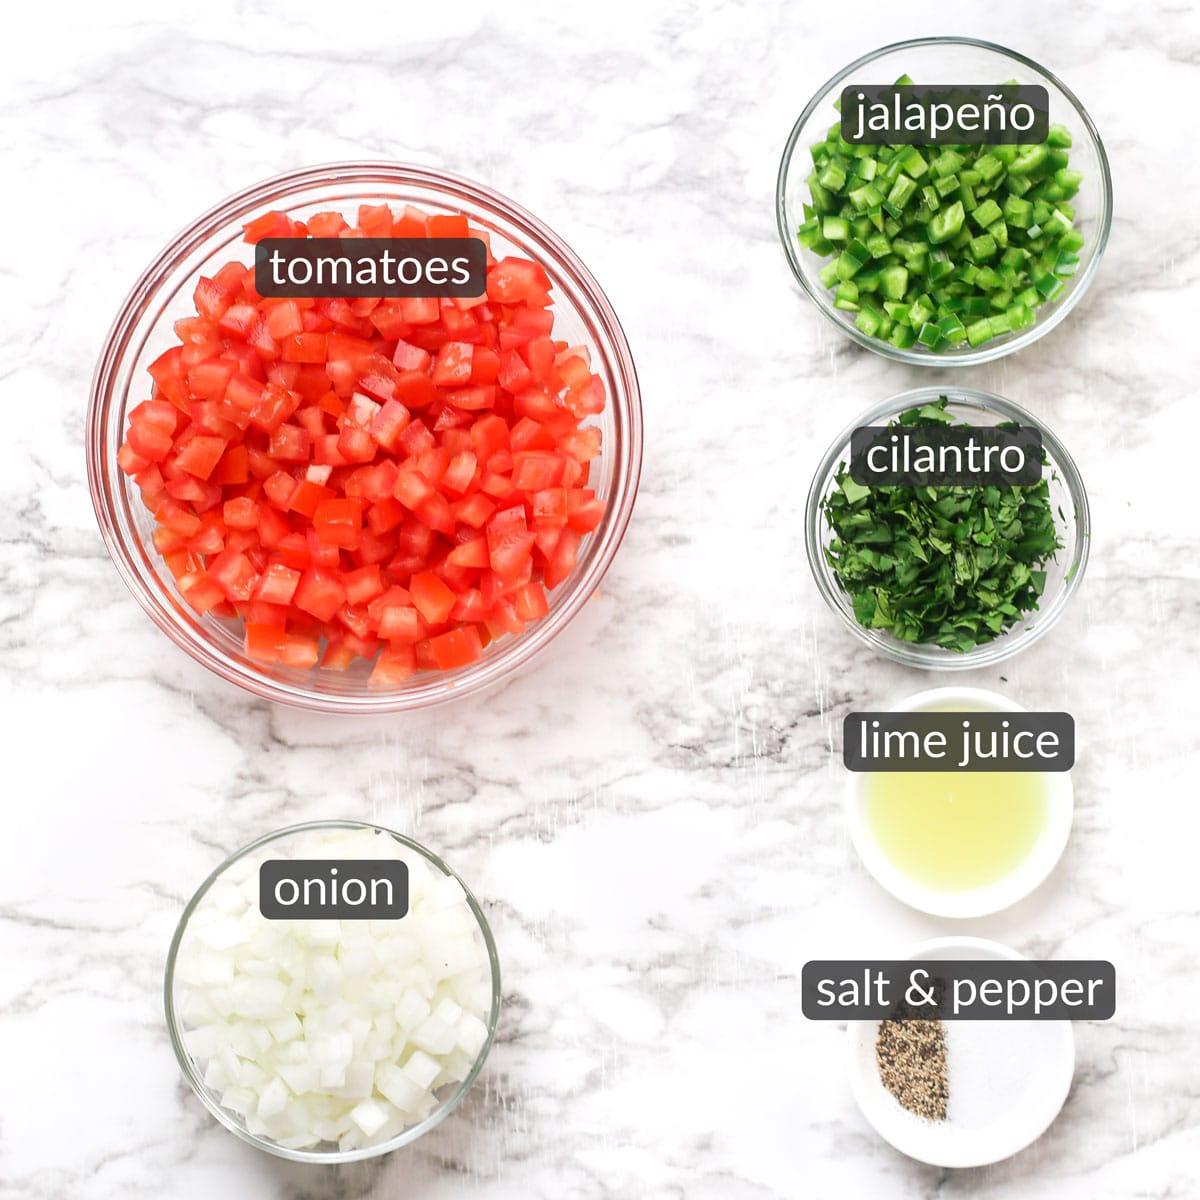 ingredients used to make pico de gallo